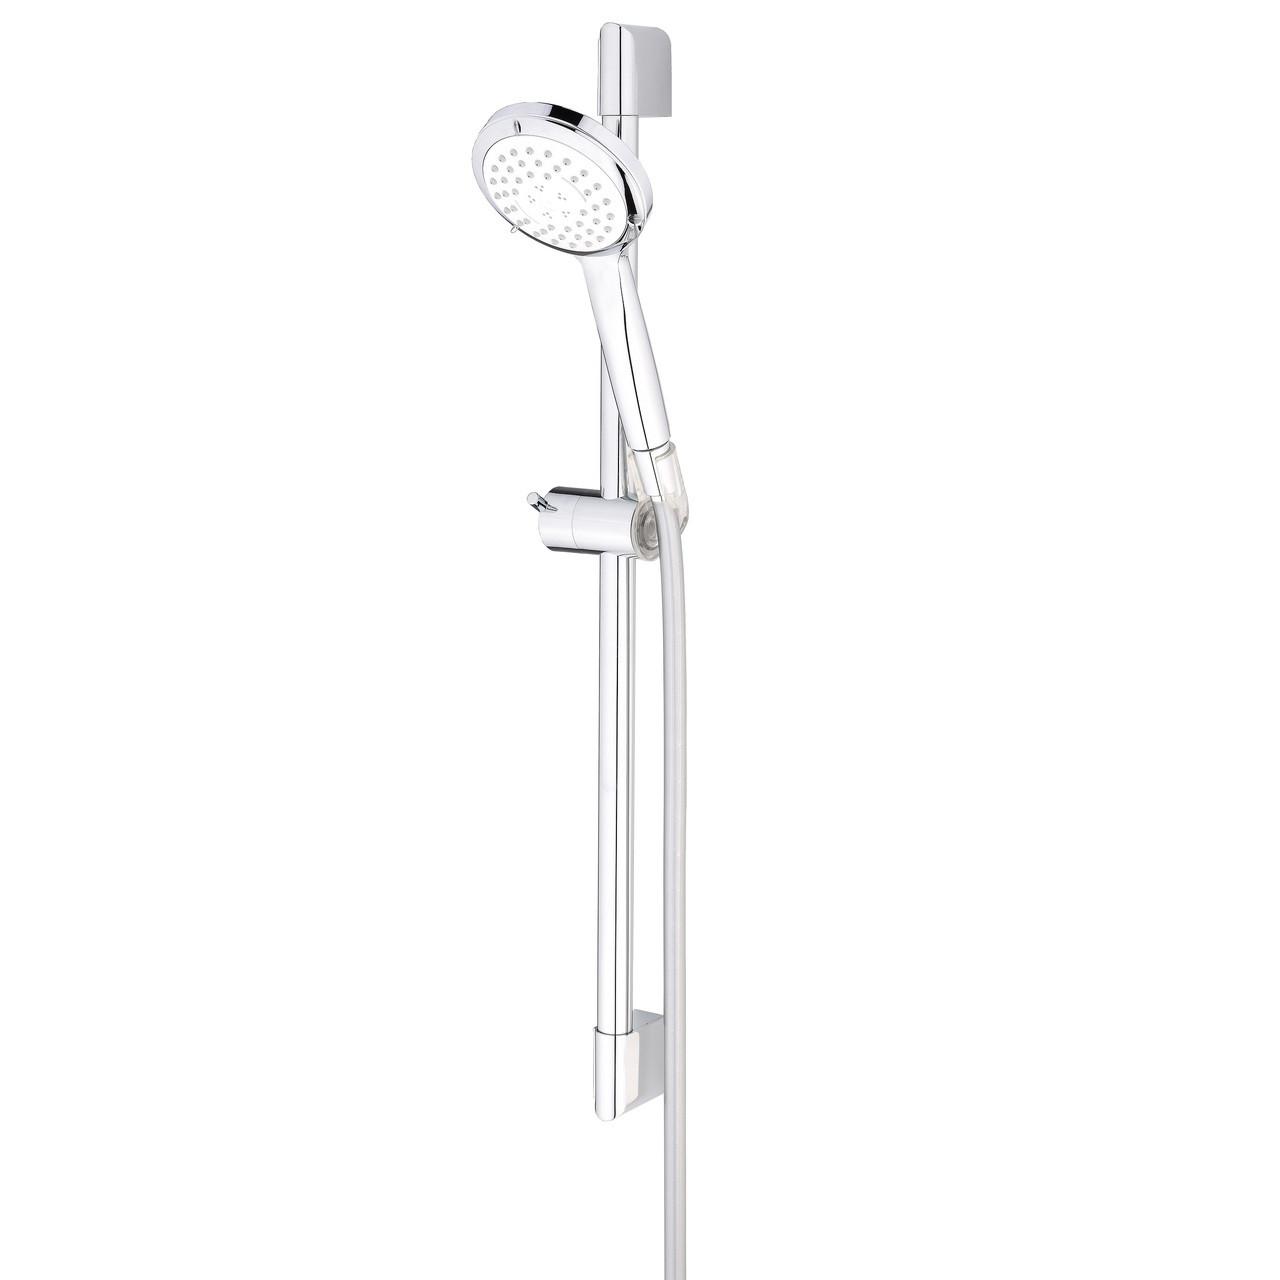 Massage Shower Head Kit 3 Spray Orta No 6 With Slide Bar Delvac